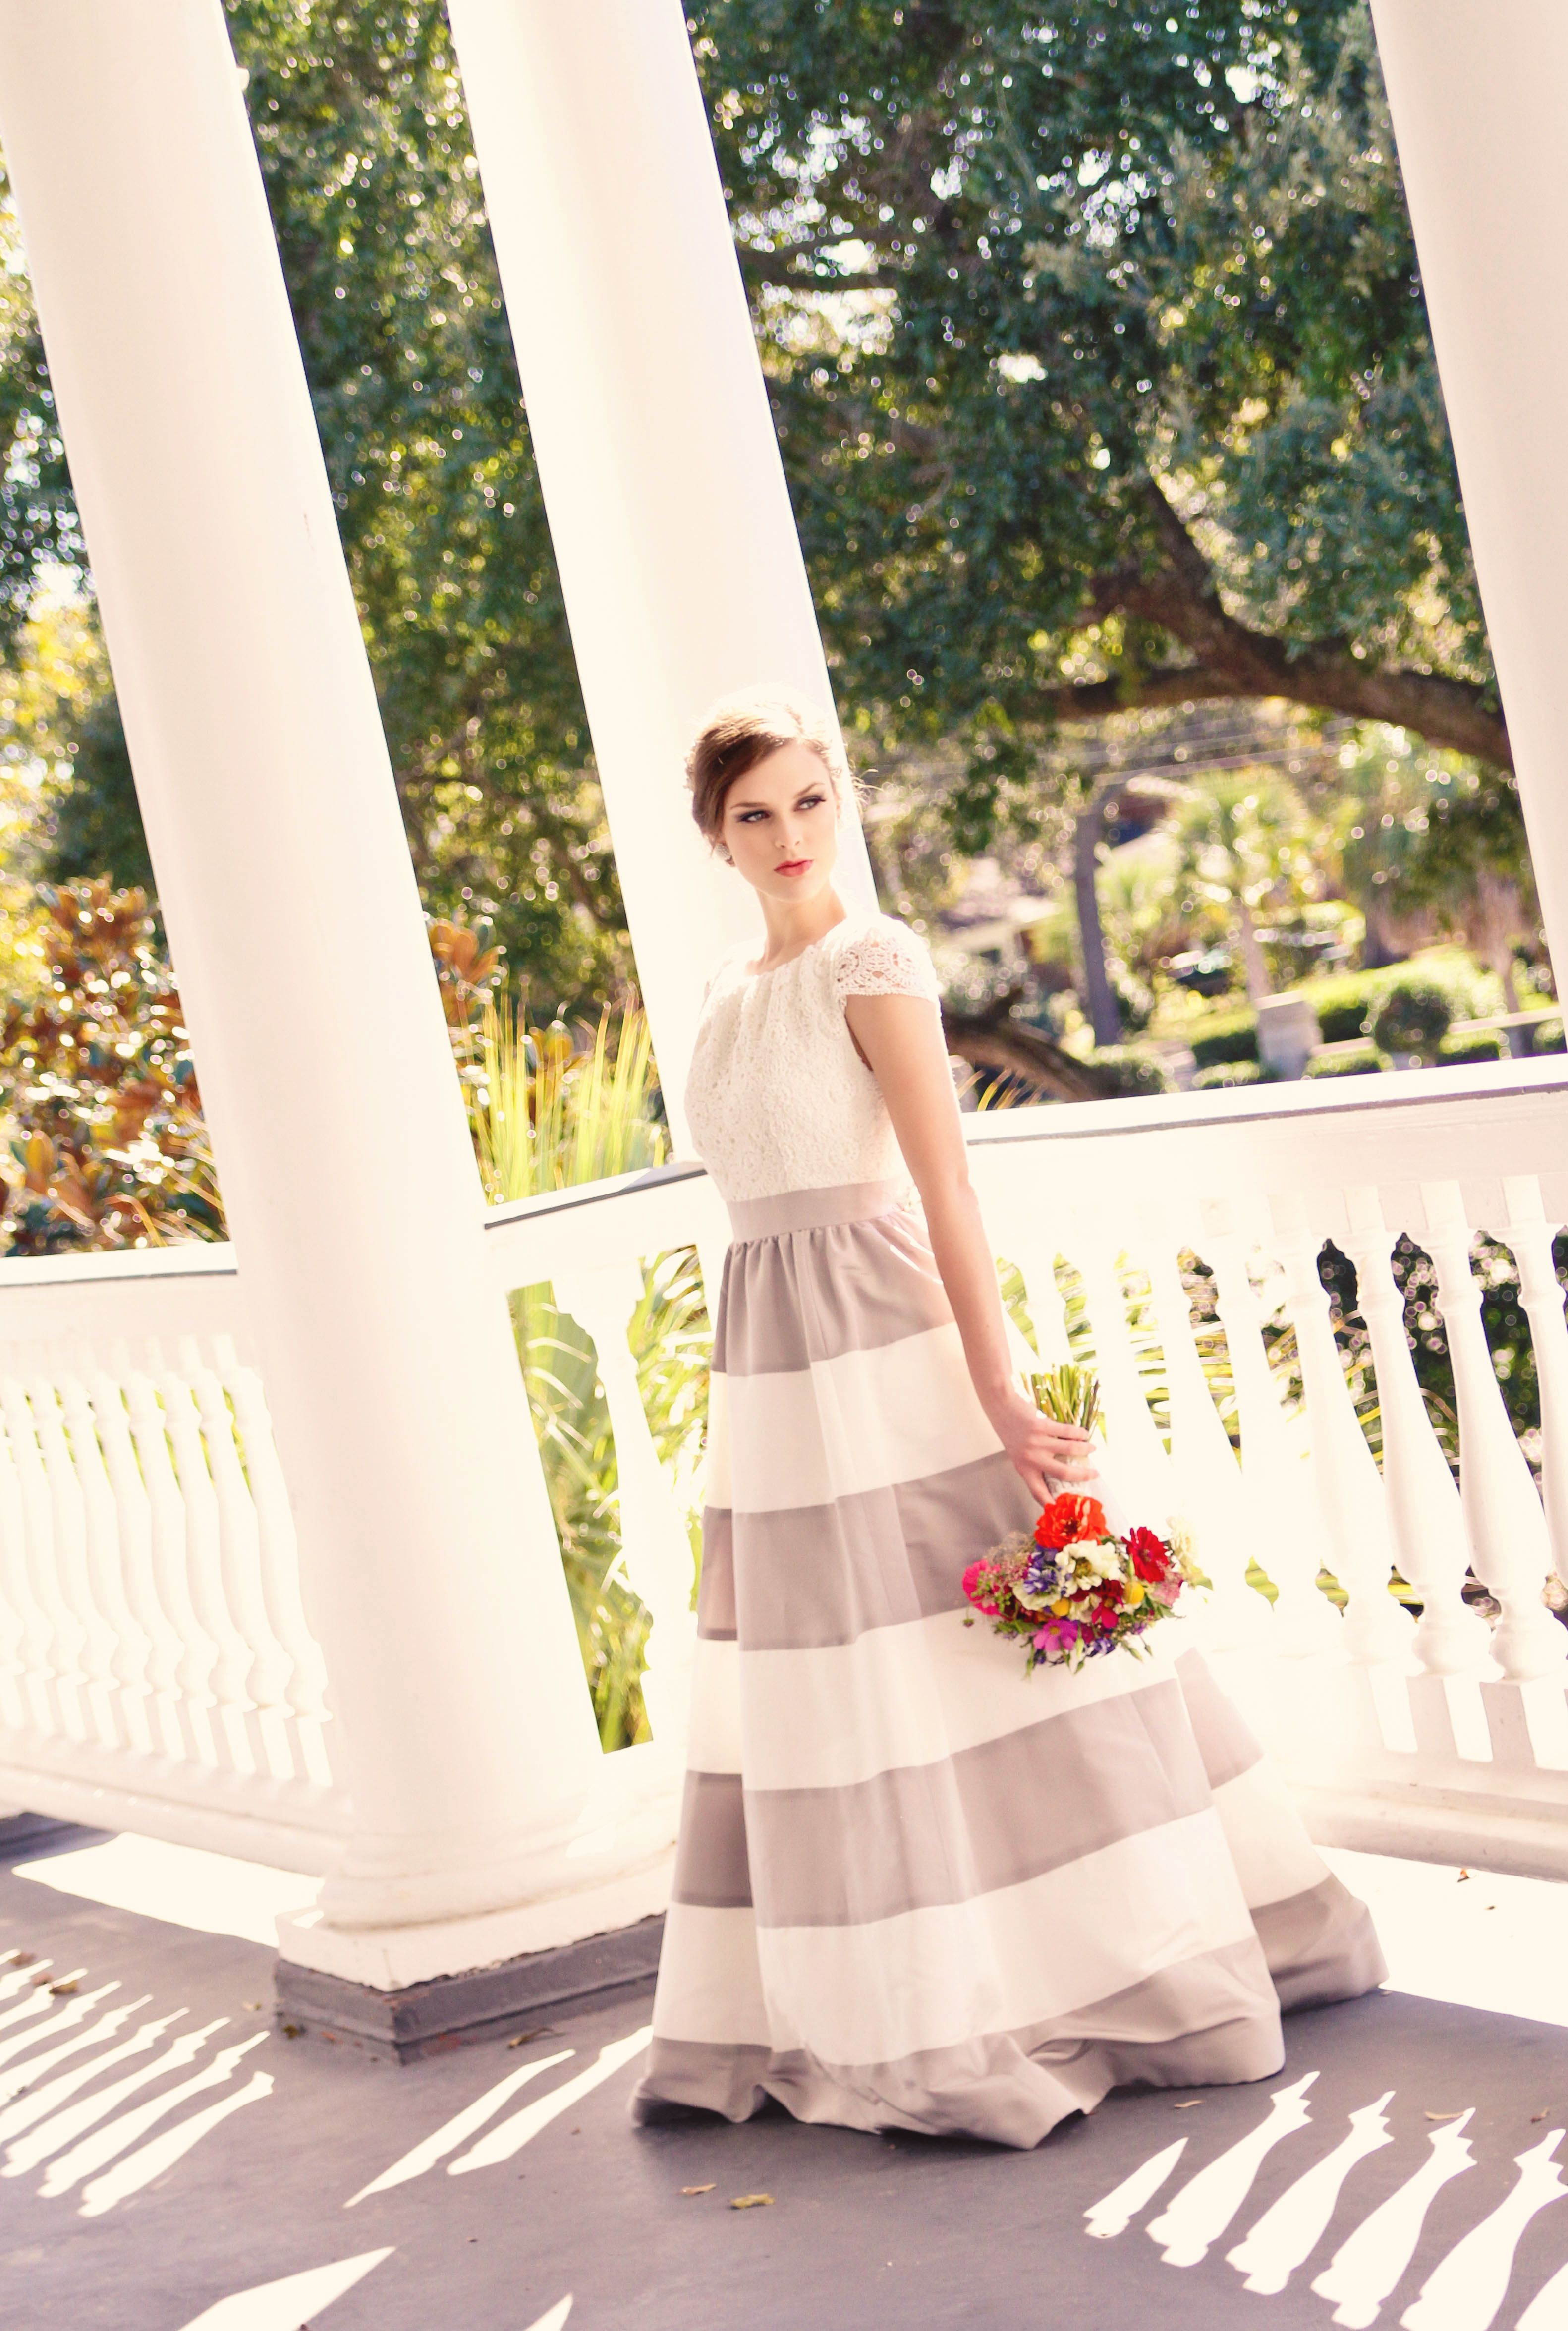 striped wedding dress shoot | ♥ Stripes Theme Wedding | Jevel ...